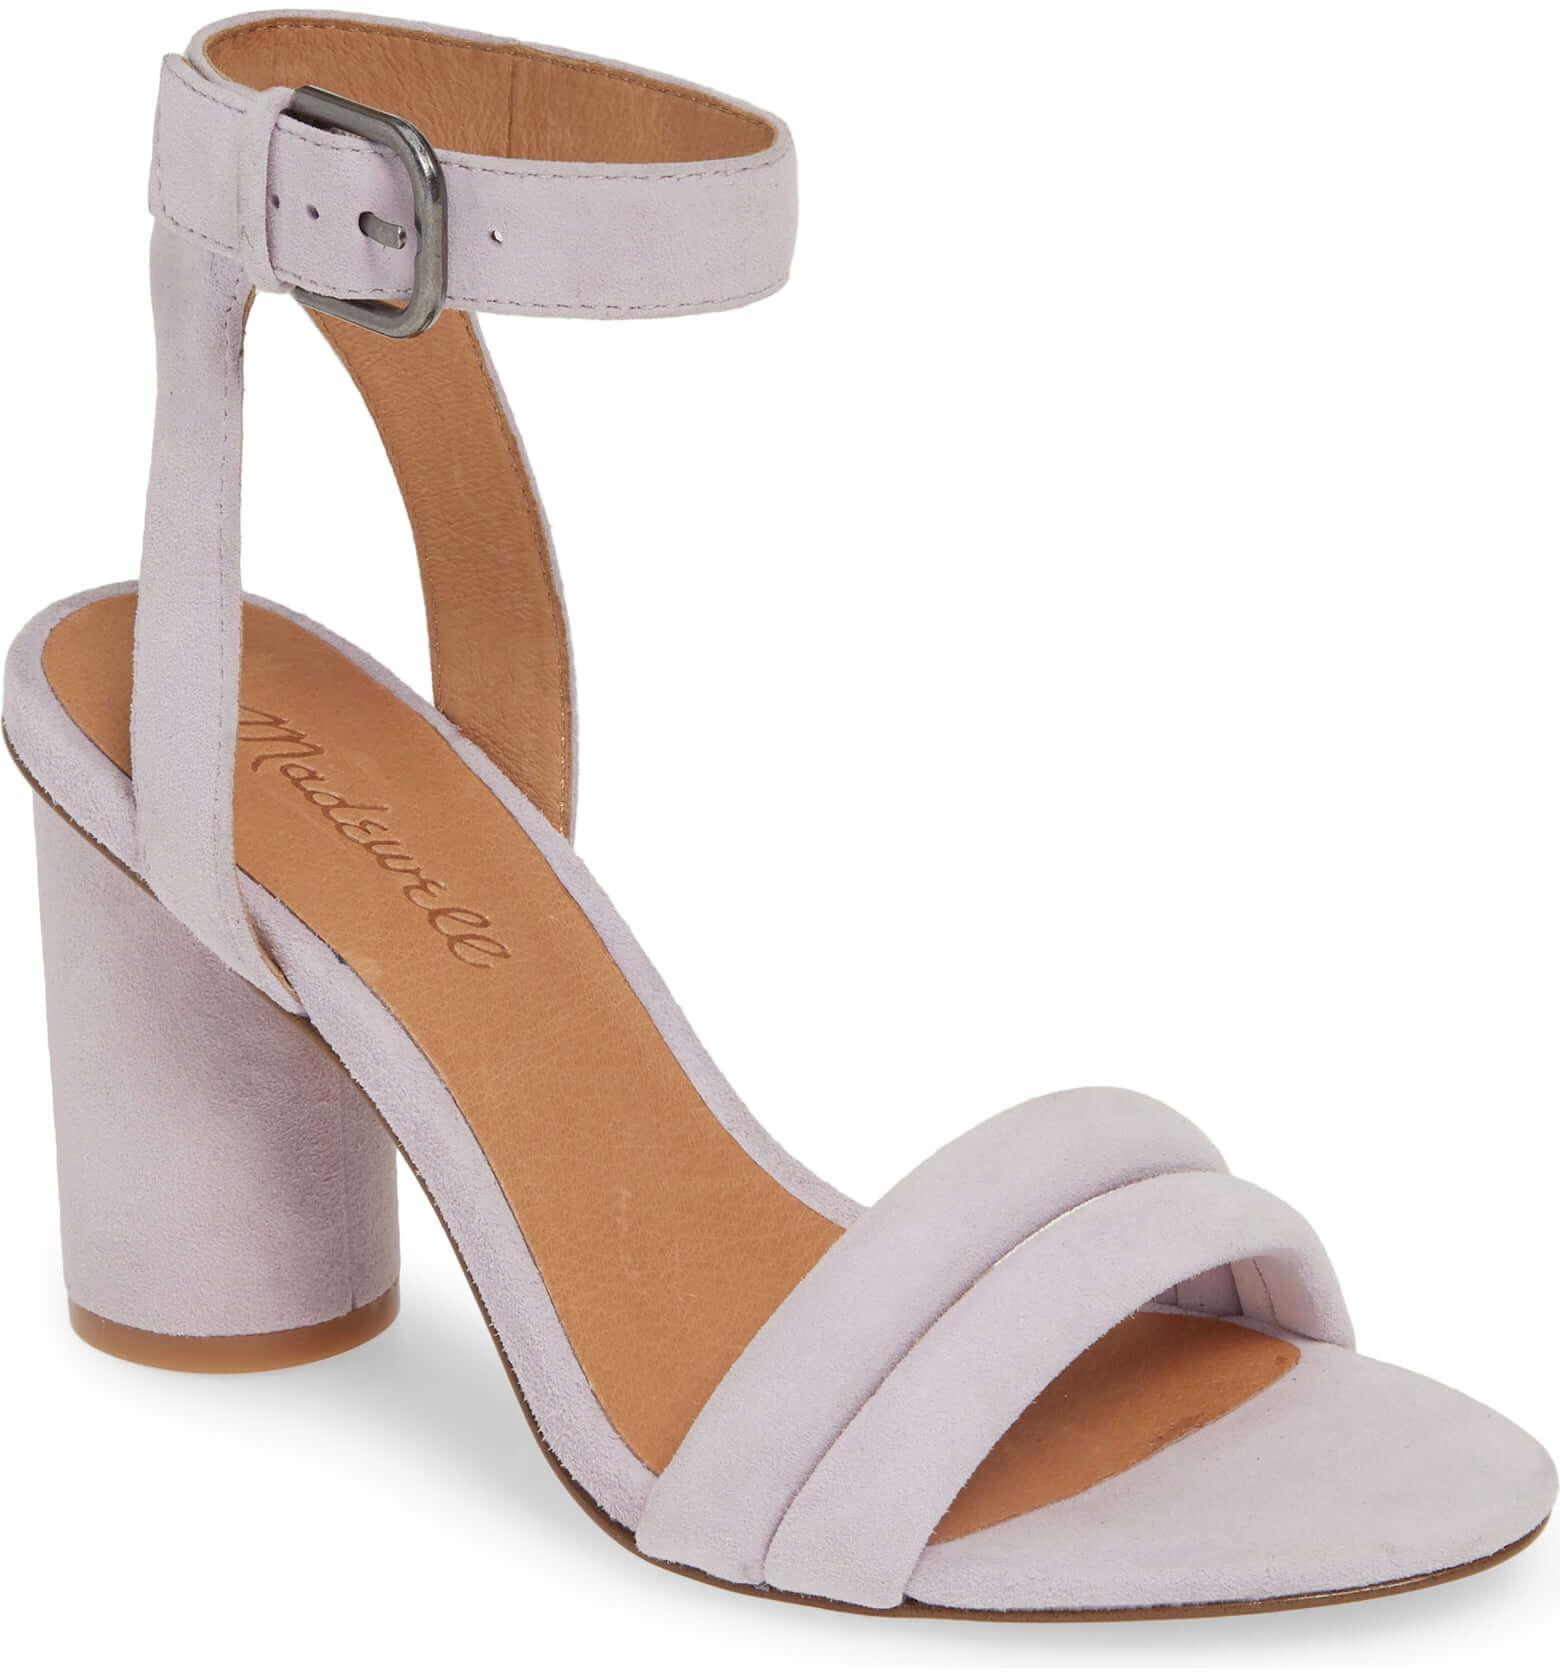 madewell-shoes-the-rosalie-high-heel-sandal.jpeg